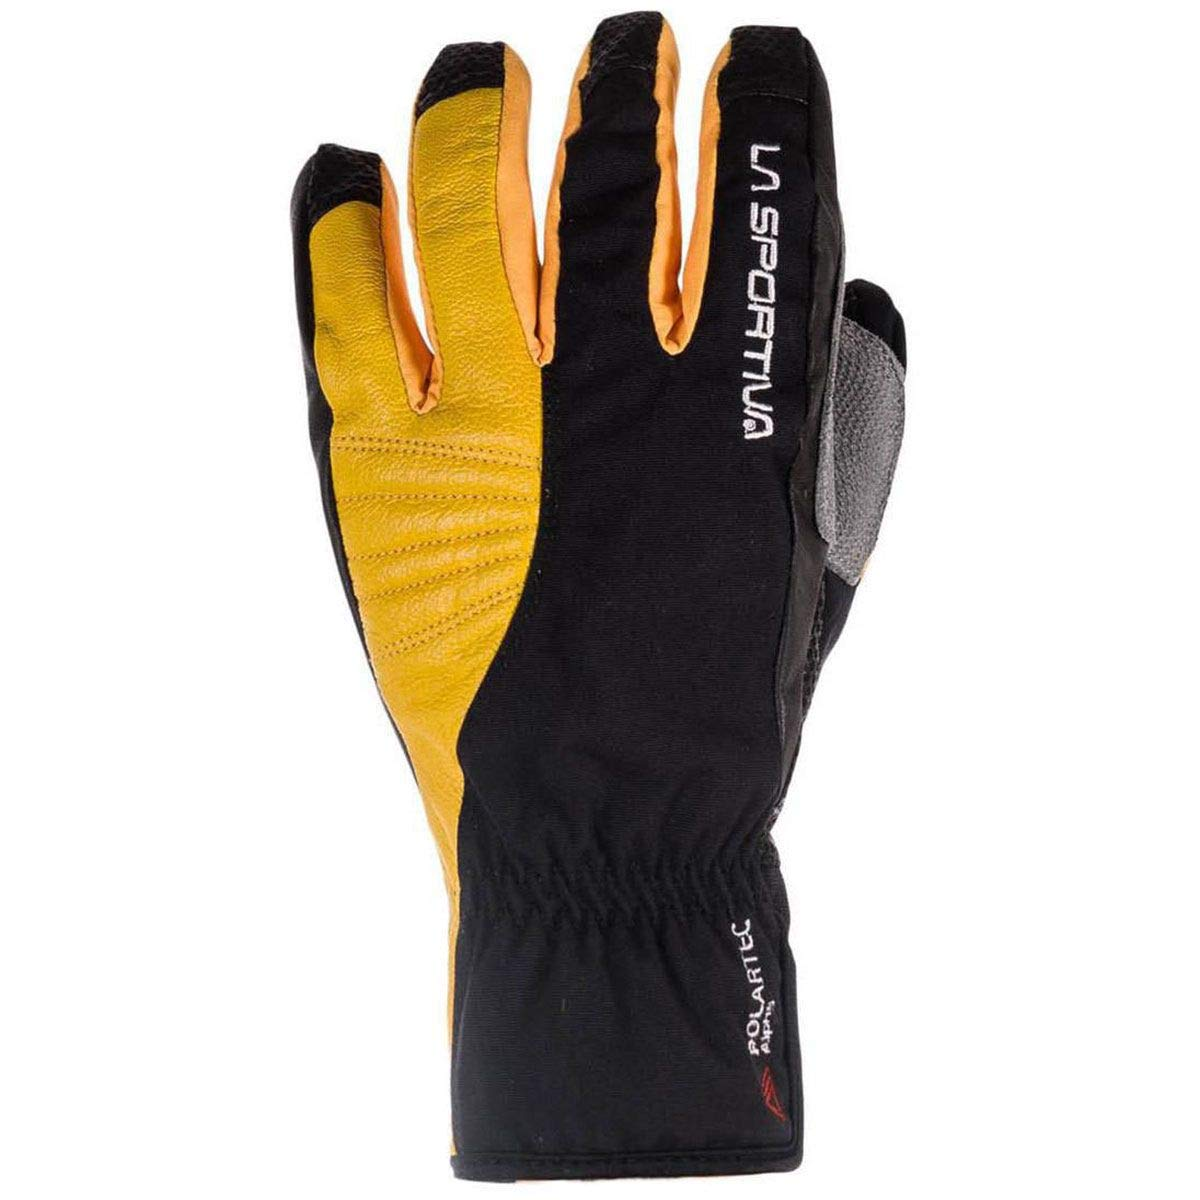 La Sportiva Tech Gloves Handschuhe, Unisex Erwachsene